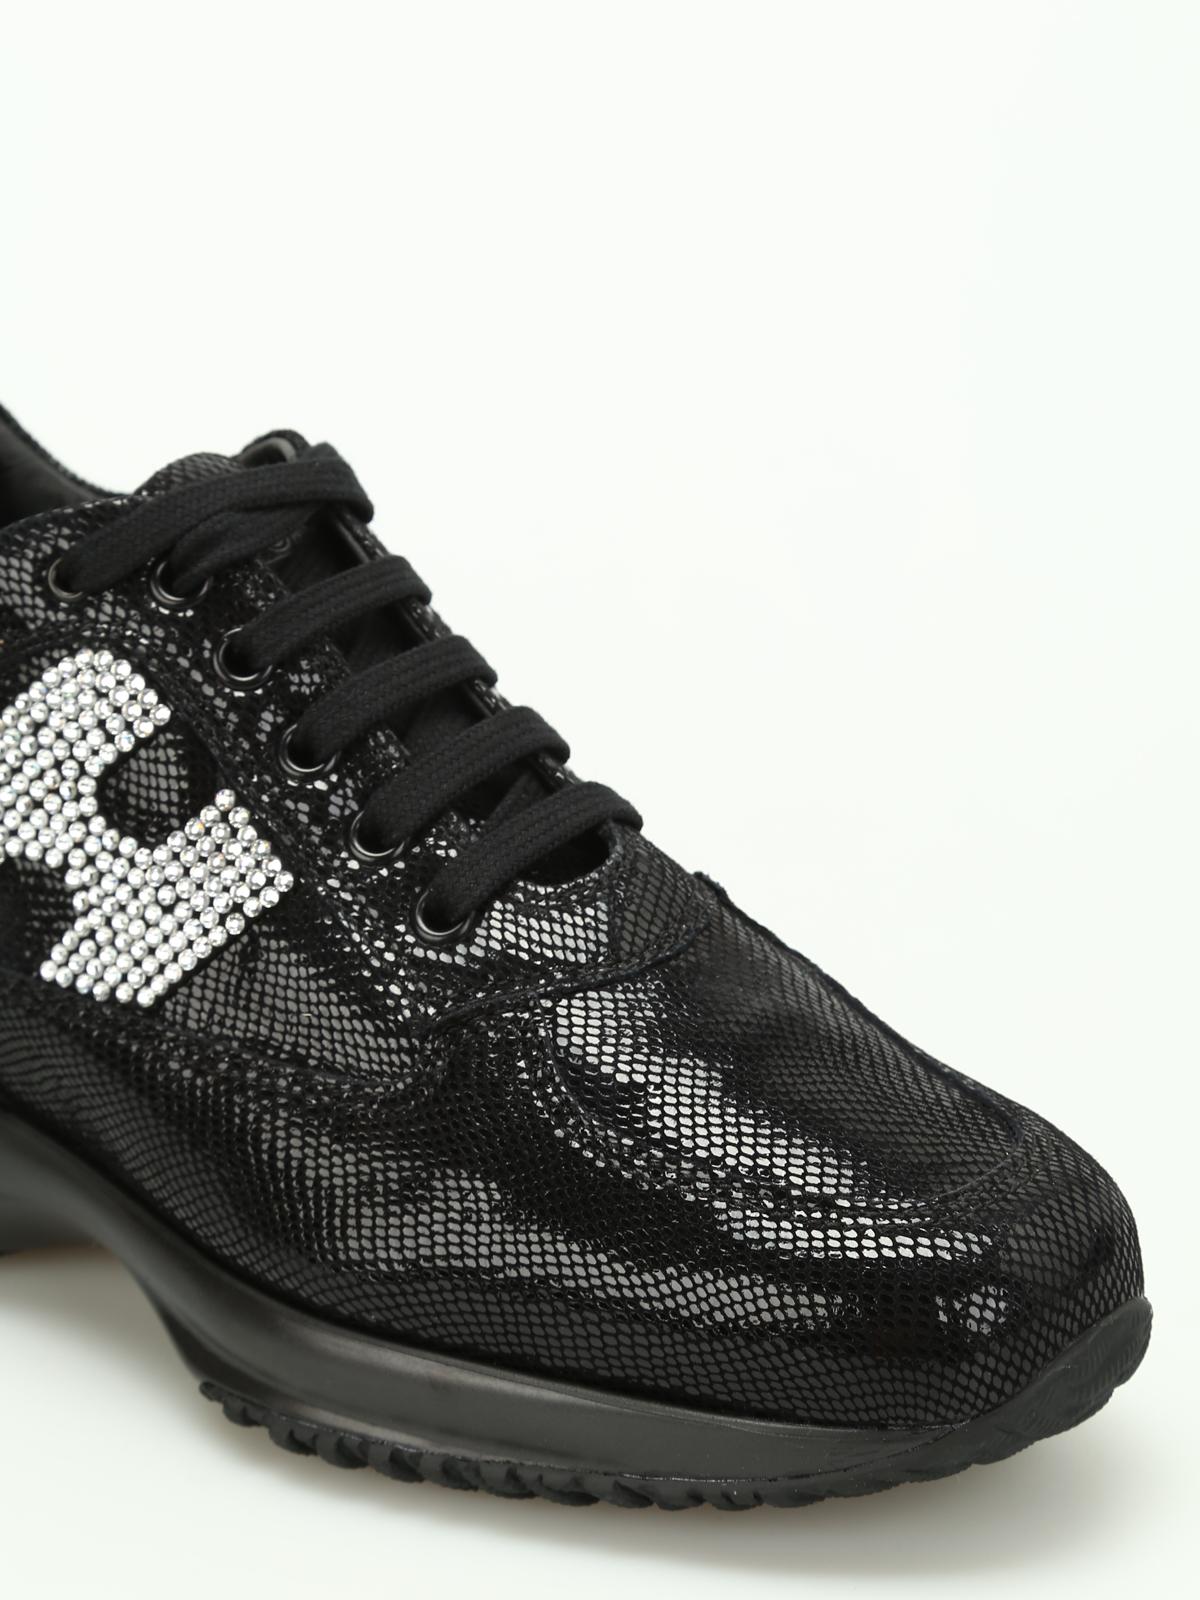 Sneakers Hogan - Interactive serpente H in strass - HXW00N02010H1SB999